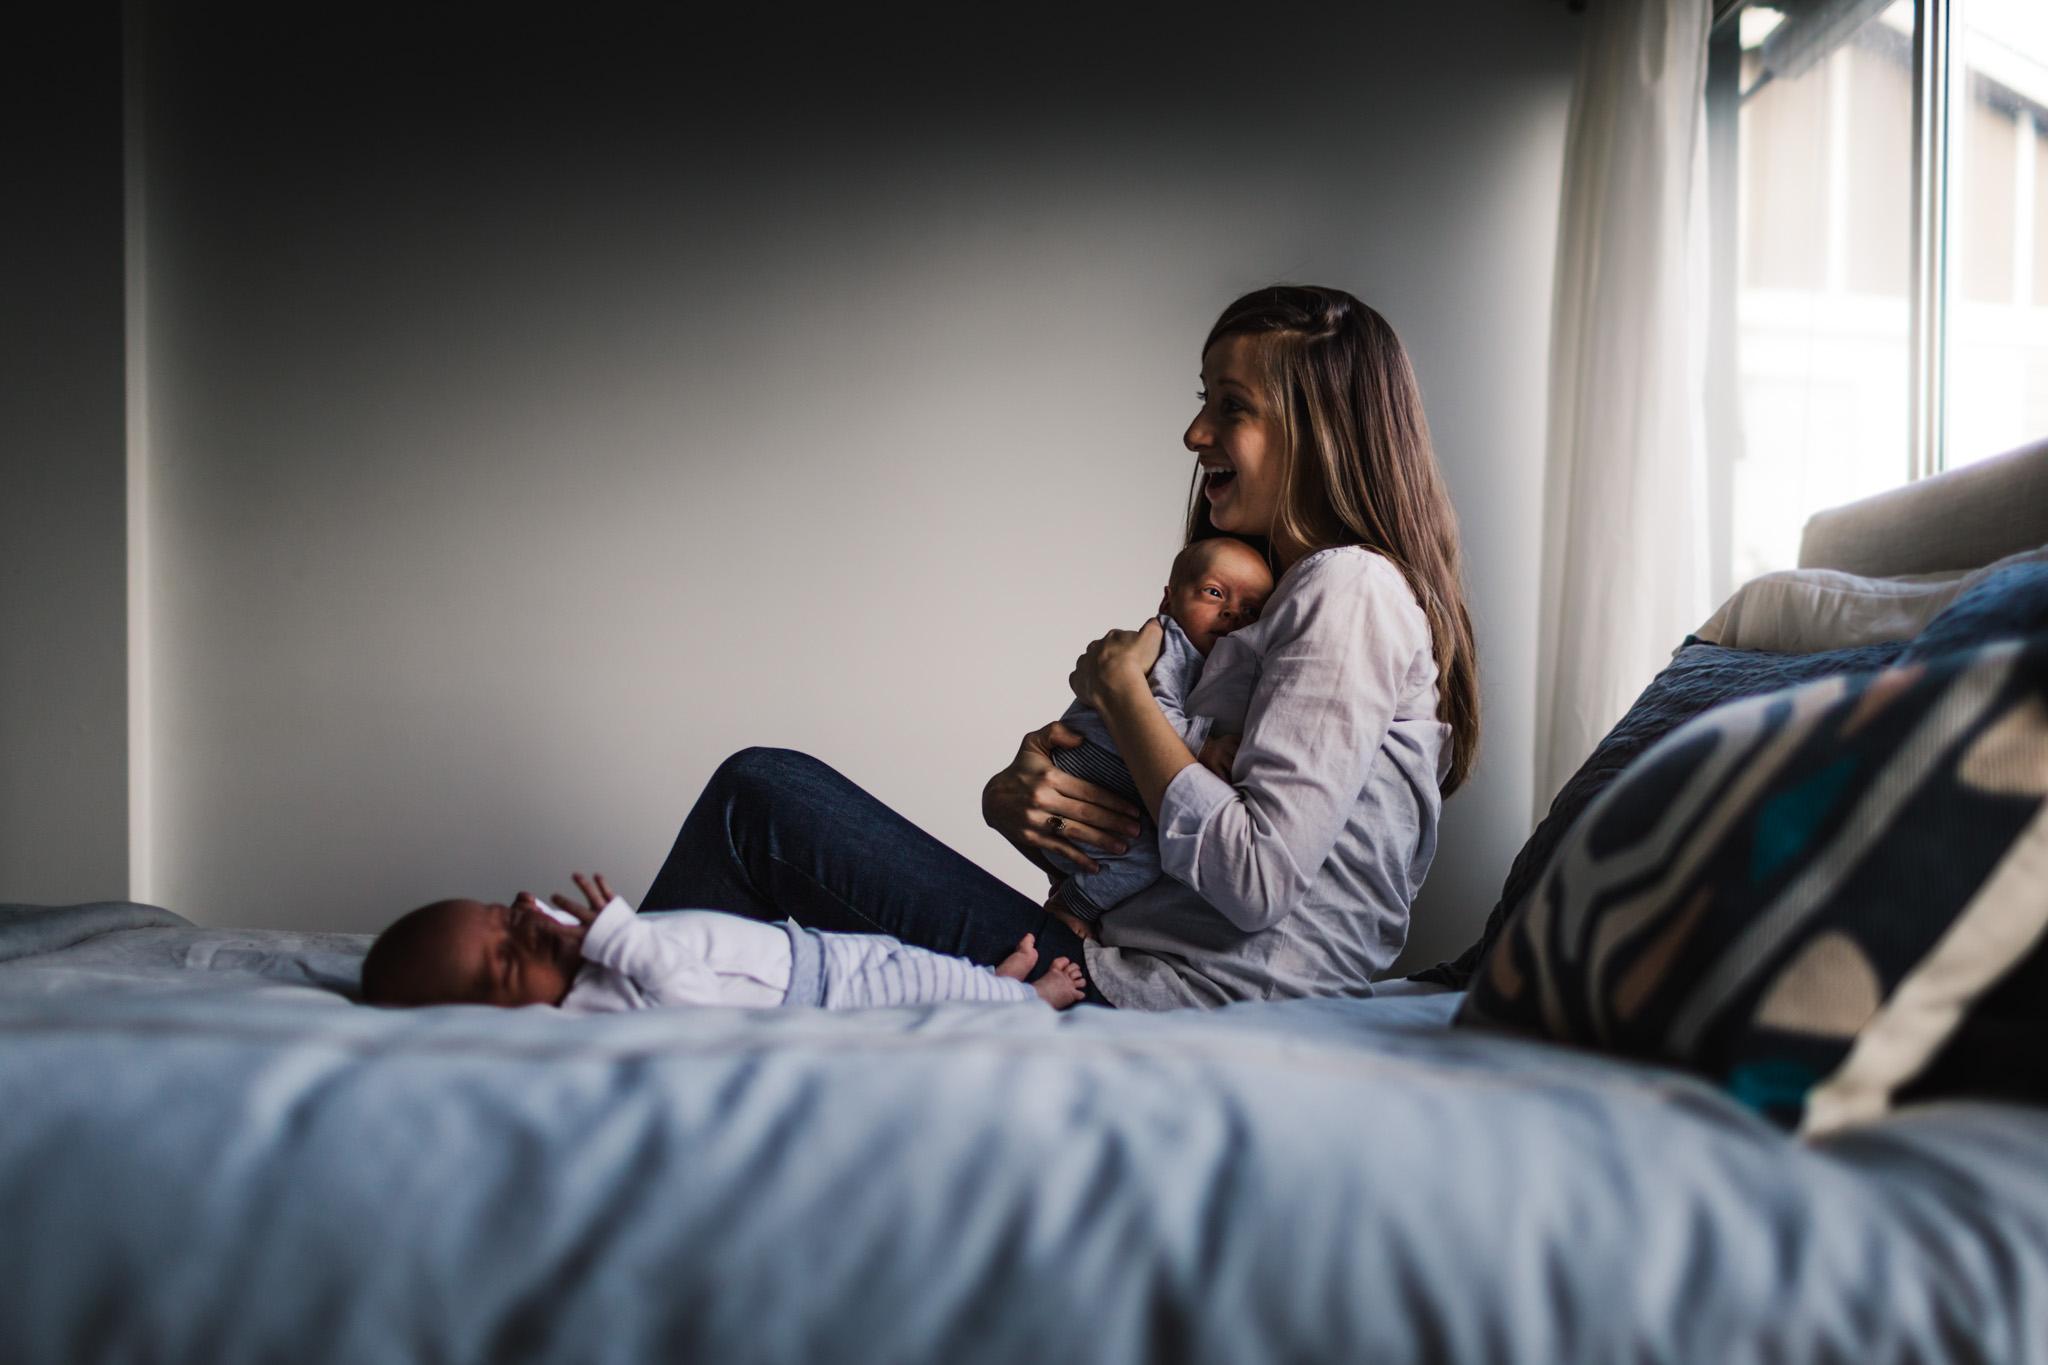 DannieMelissaWit_AbeillePhotography.com_Newborn_Lifestyle_Photography-51.jpg